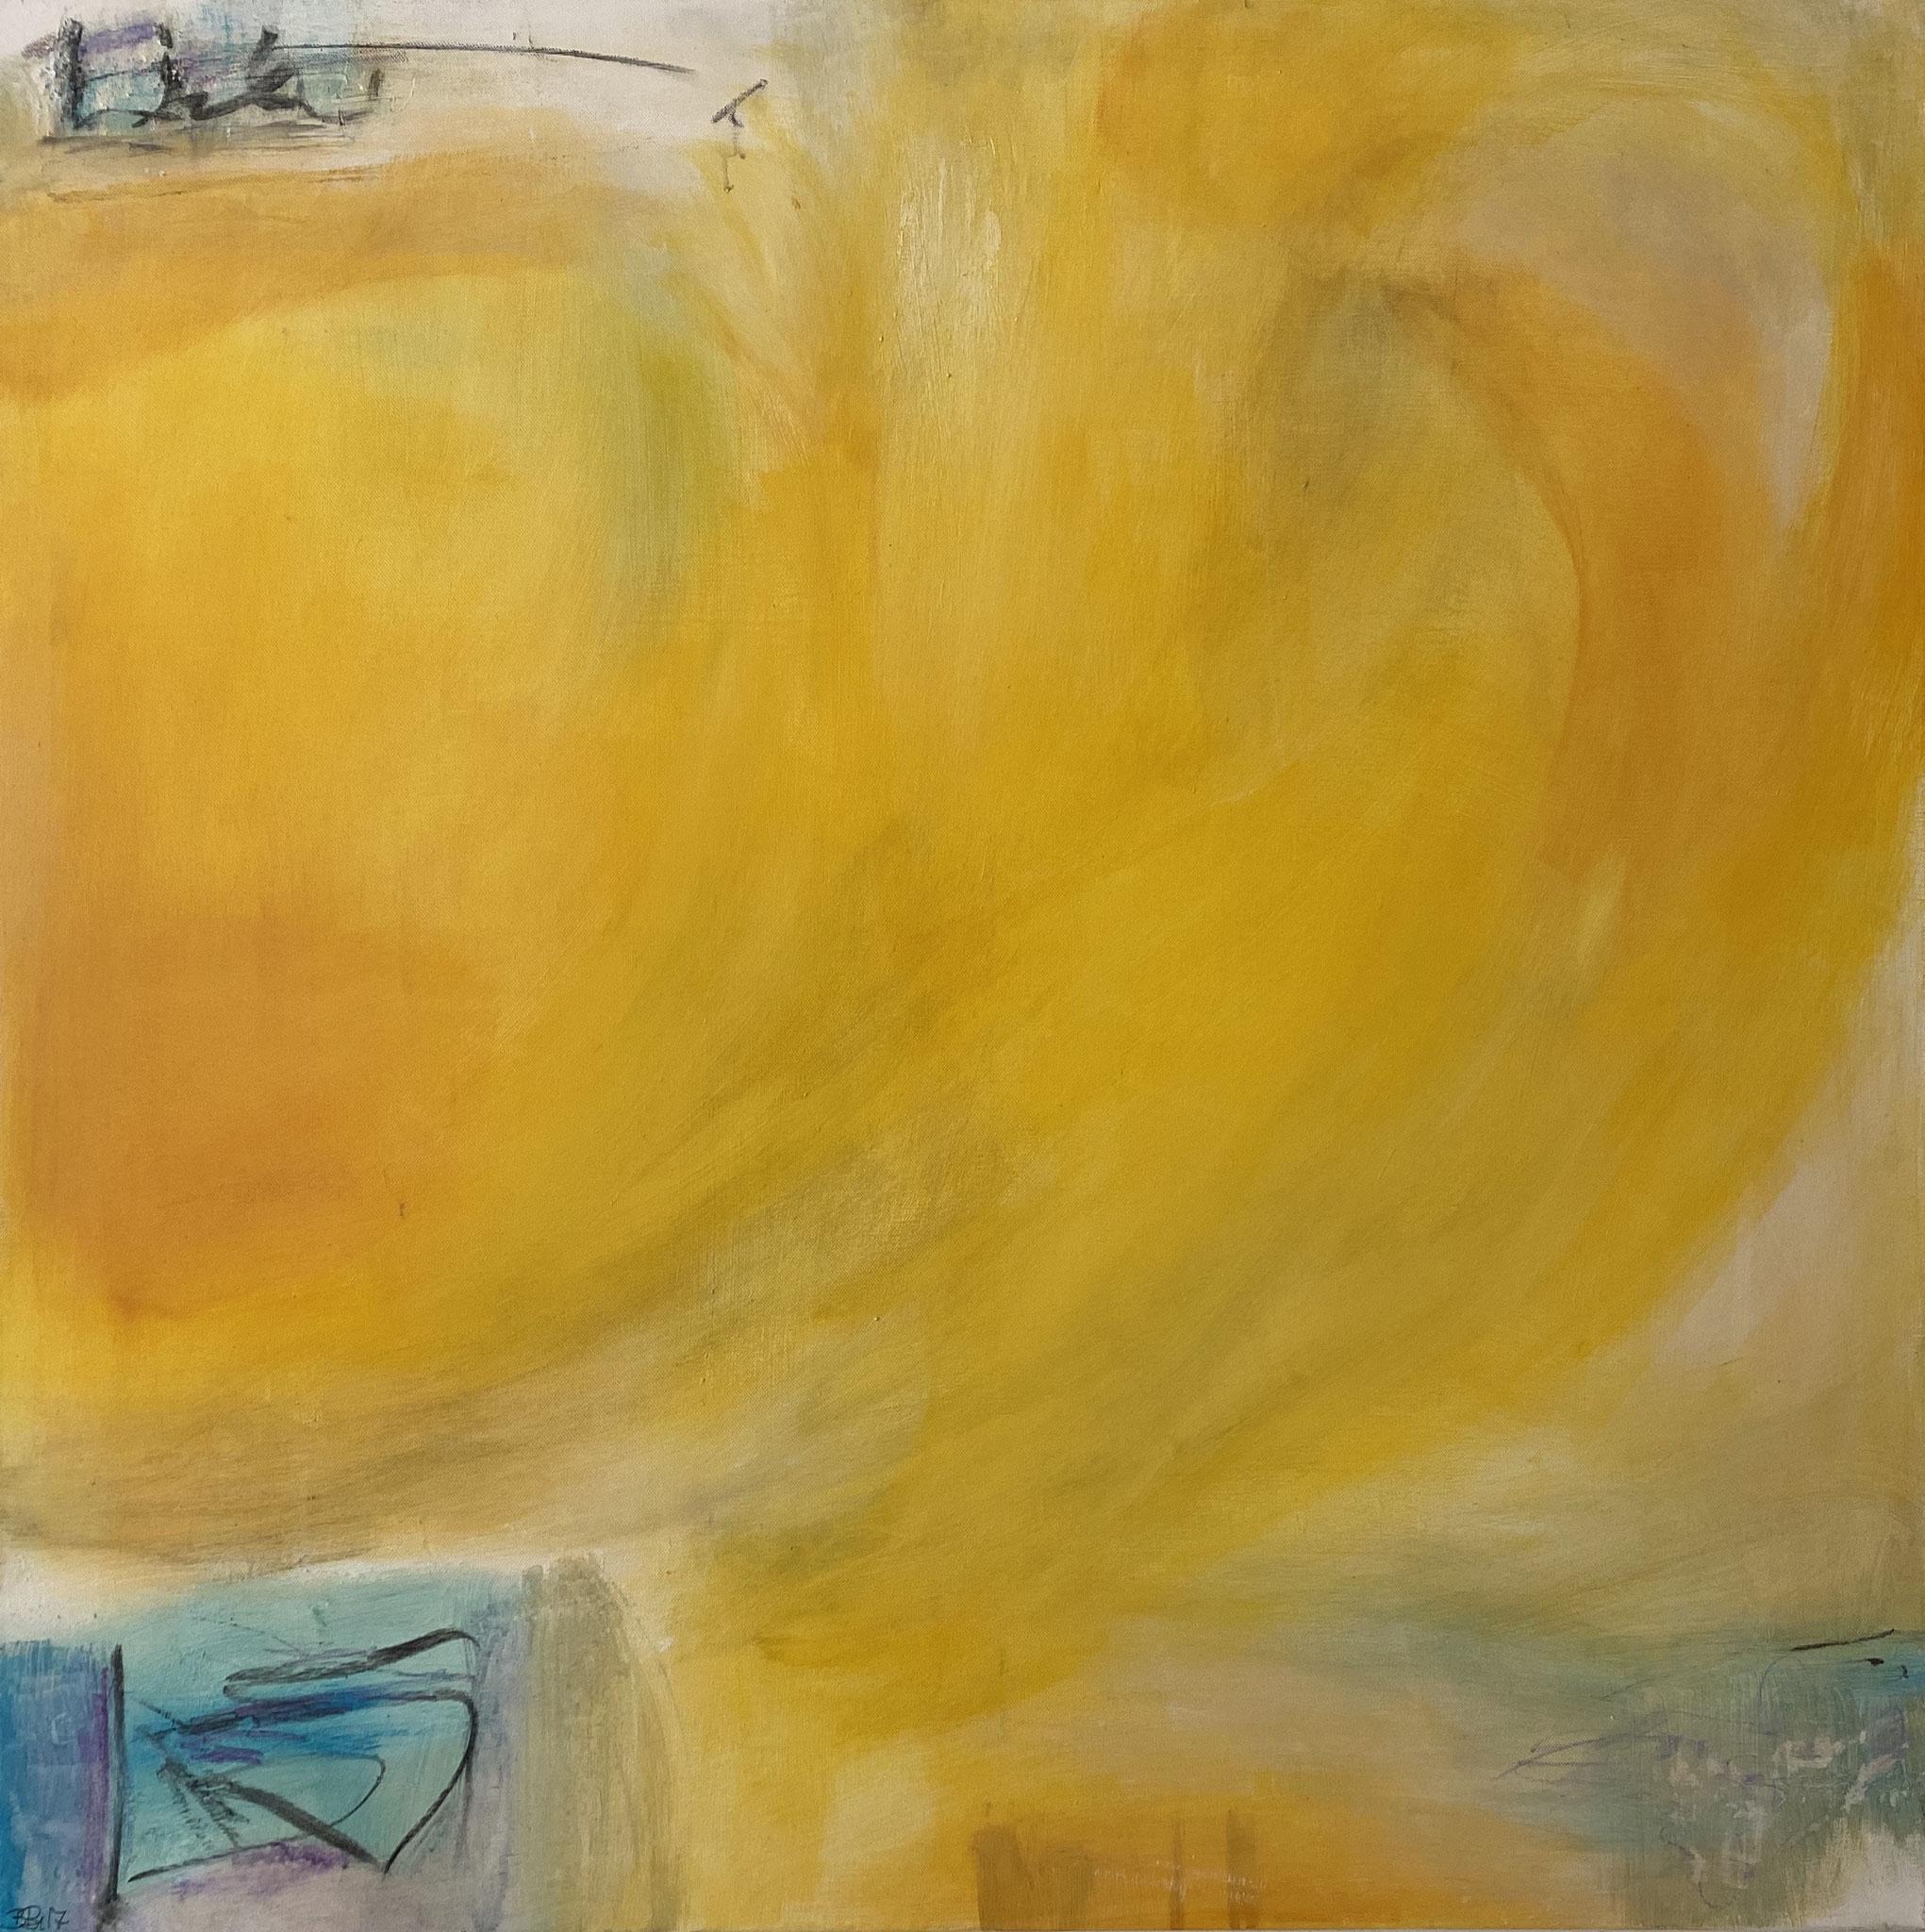 Ohne Titel | 100 x 100 cm | Acryl auf Leinwand | 2018